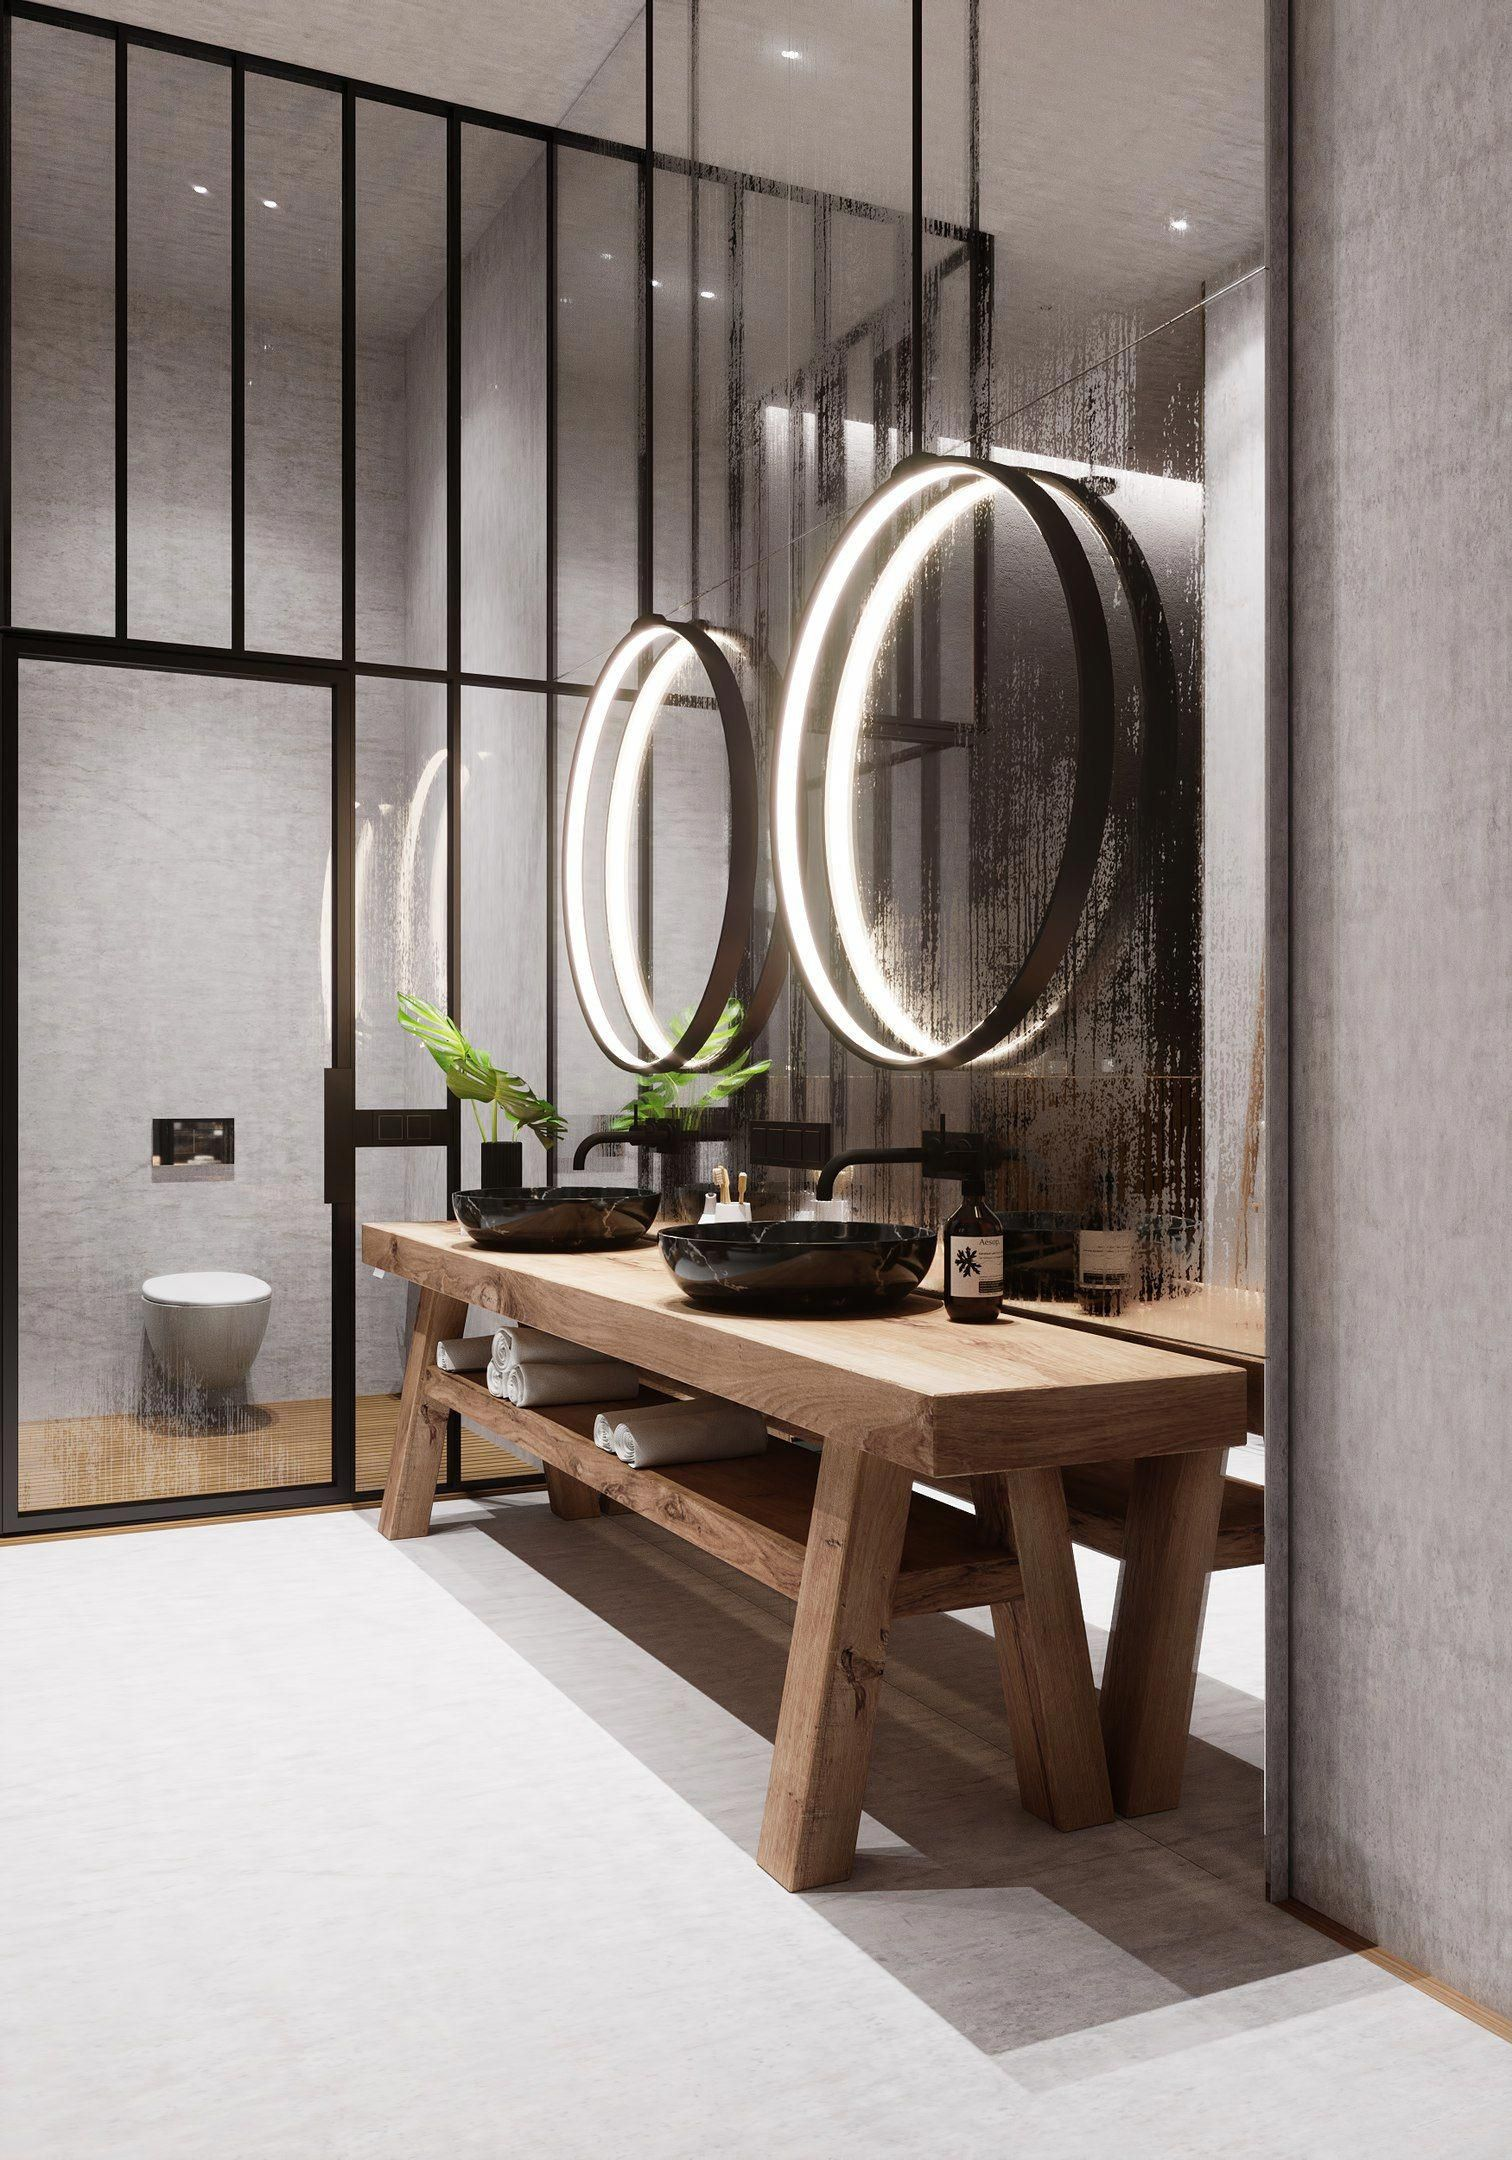 Cg bandit обучающий курс corona renderer ps modernbathrooms bathroom interior modern bathroom small